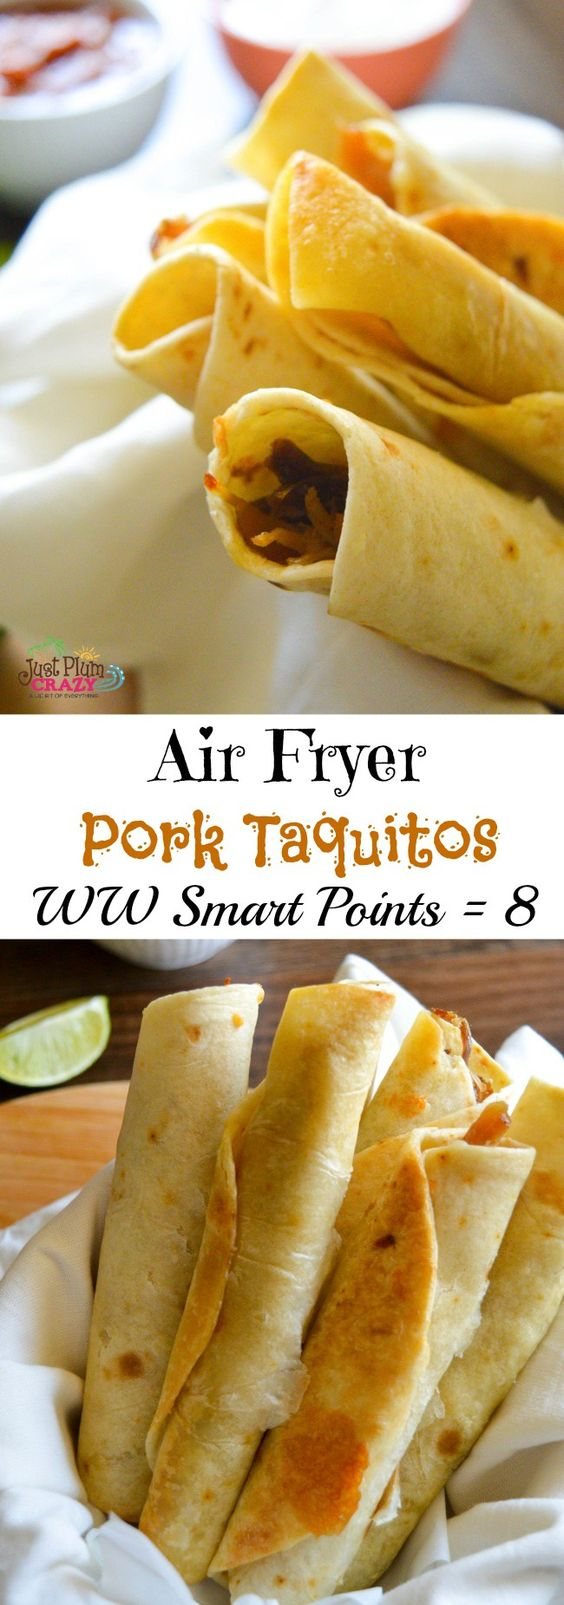 Healthy Air Fryer Recipes: Air Fryer Weight Watchers Pork Taquitos